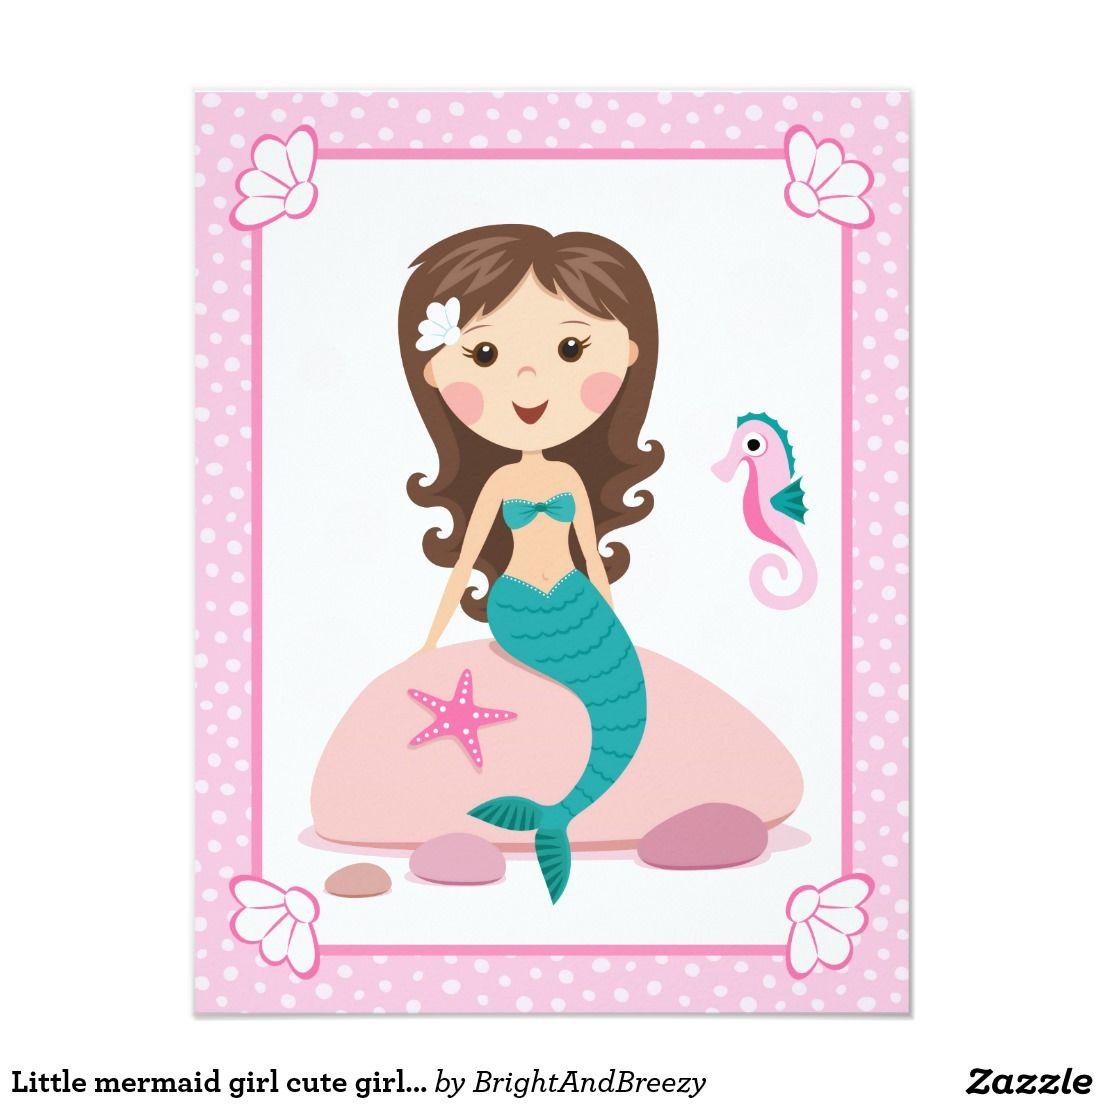 Little mermaid girl cute girly birthday invitation | Little ...